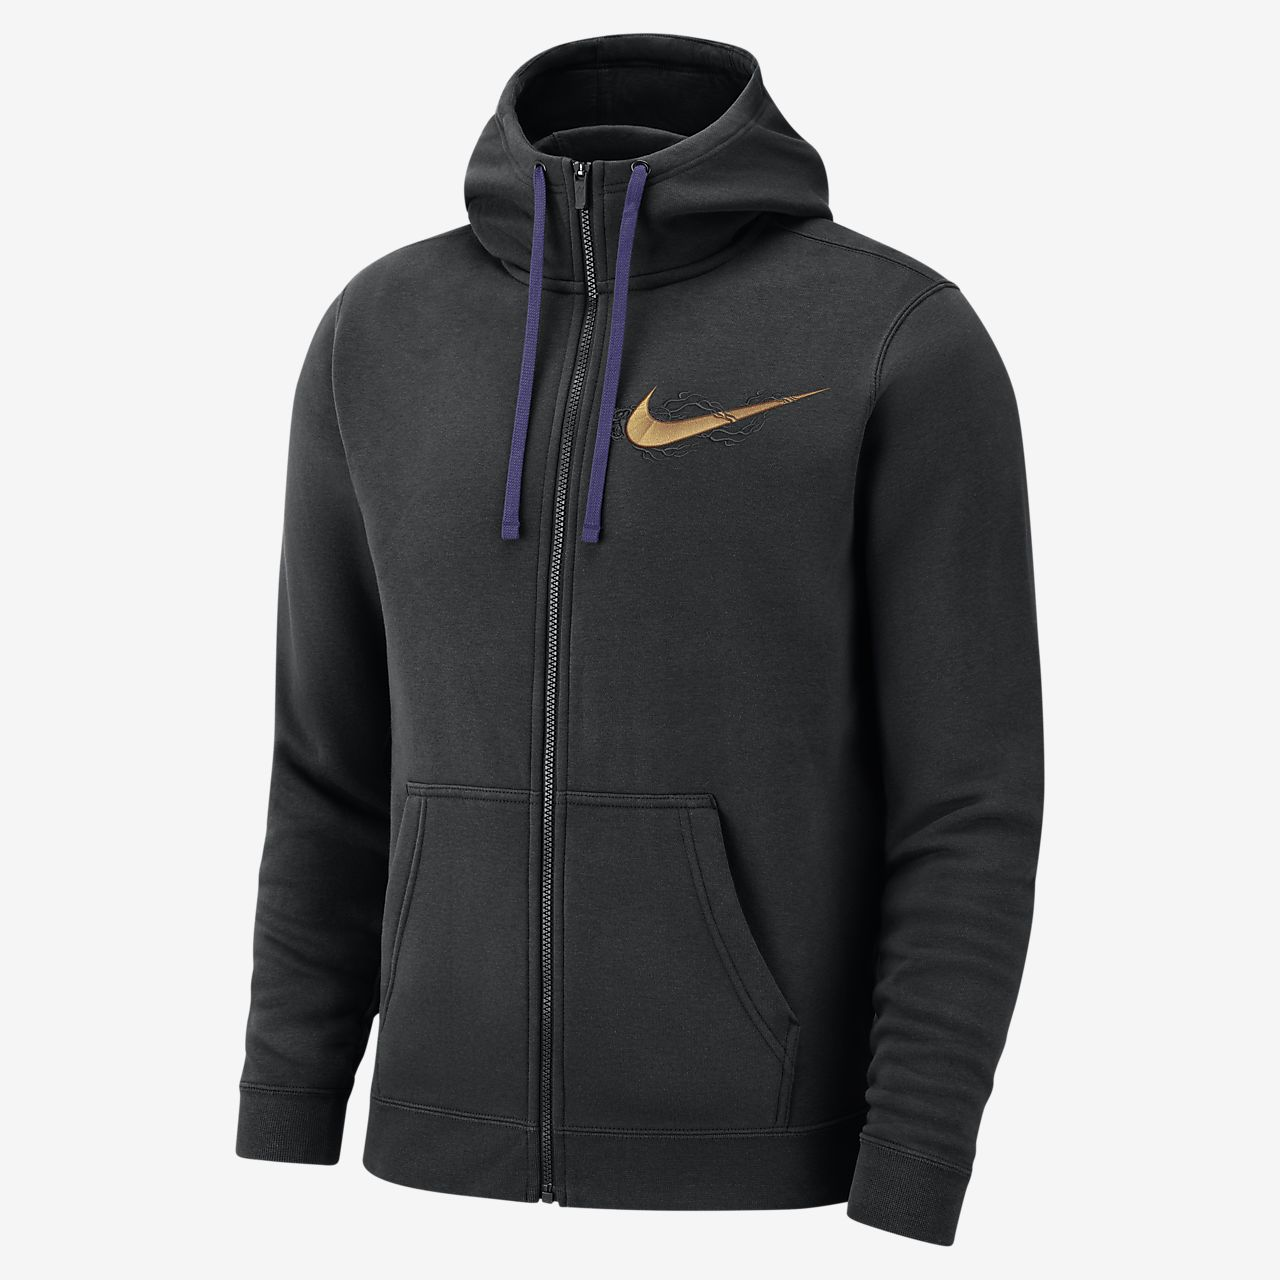 Team 31 'Chinese New Year' Nike NBA 男子全长拉链开襟连帽衫